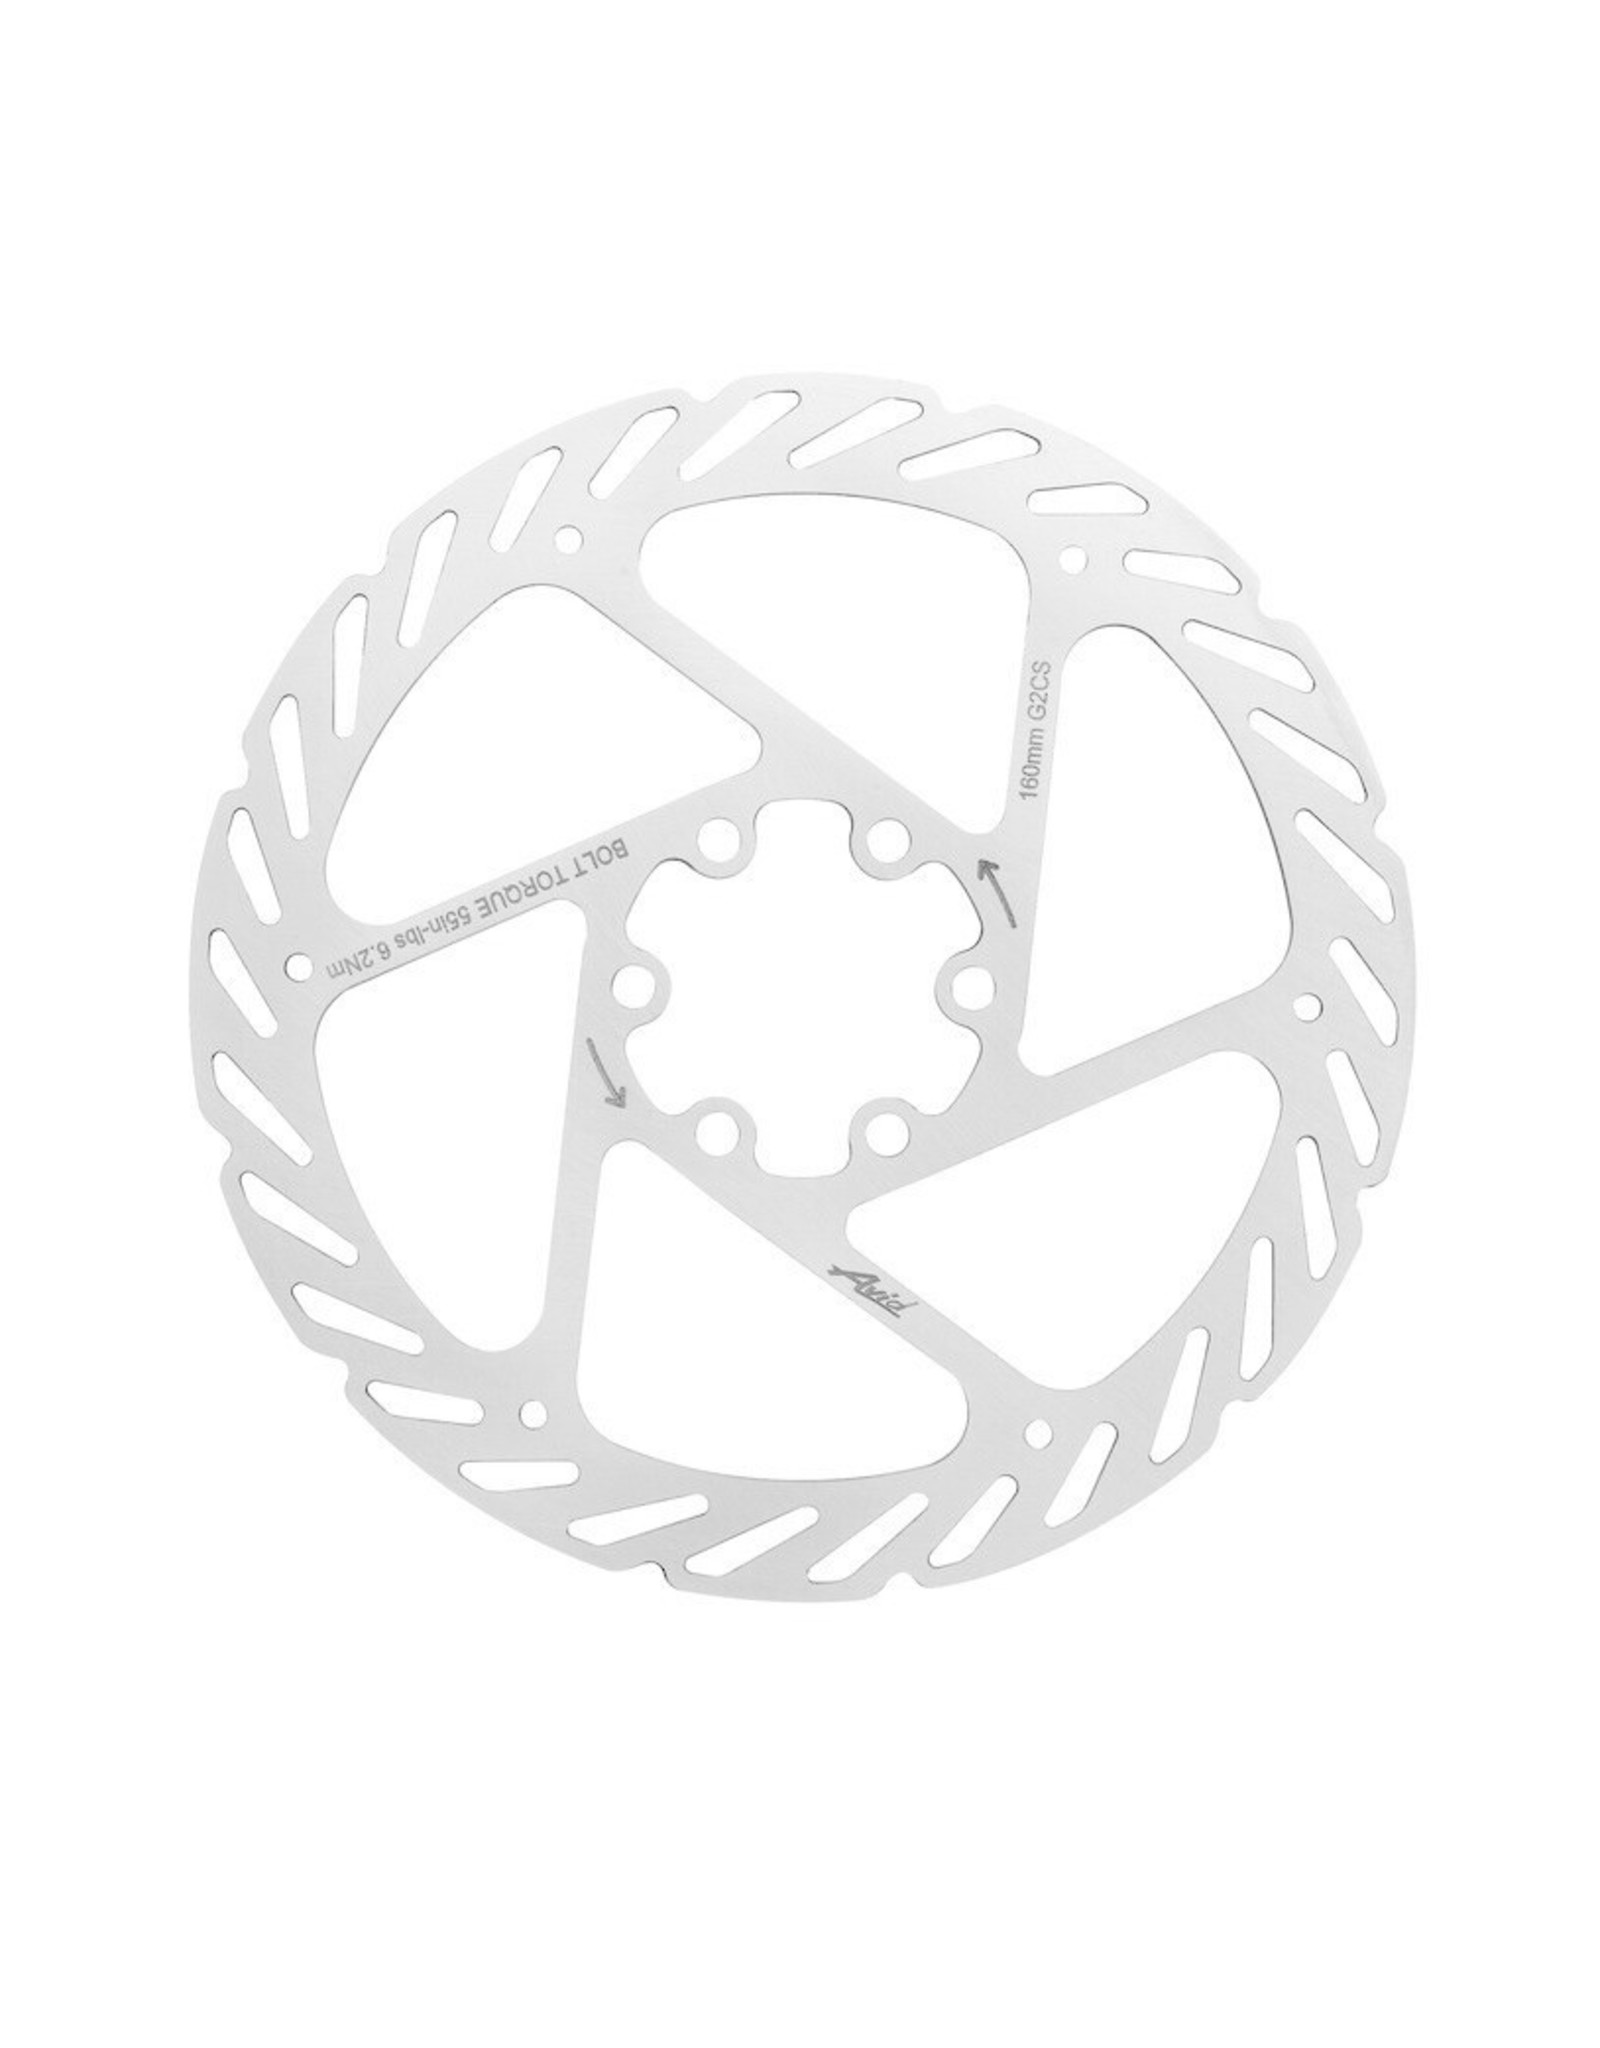 Avid Avid G2 Clean Sweep 160mm Rotor